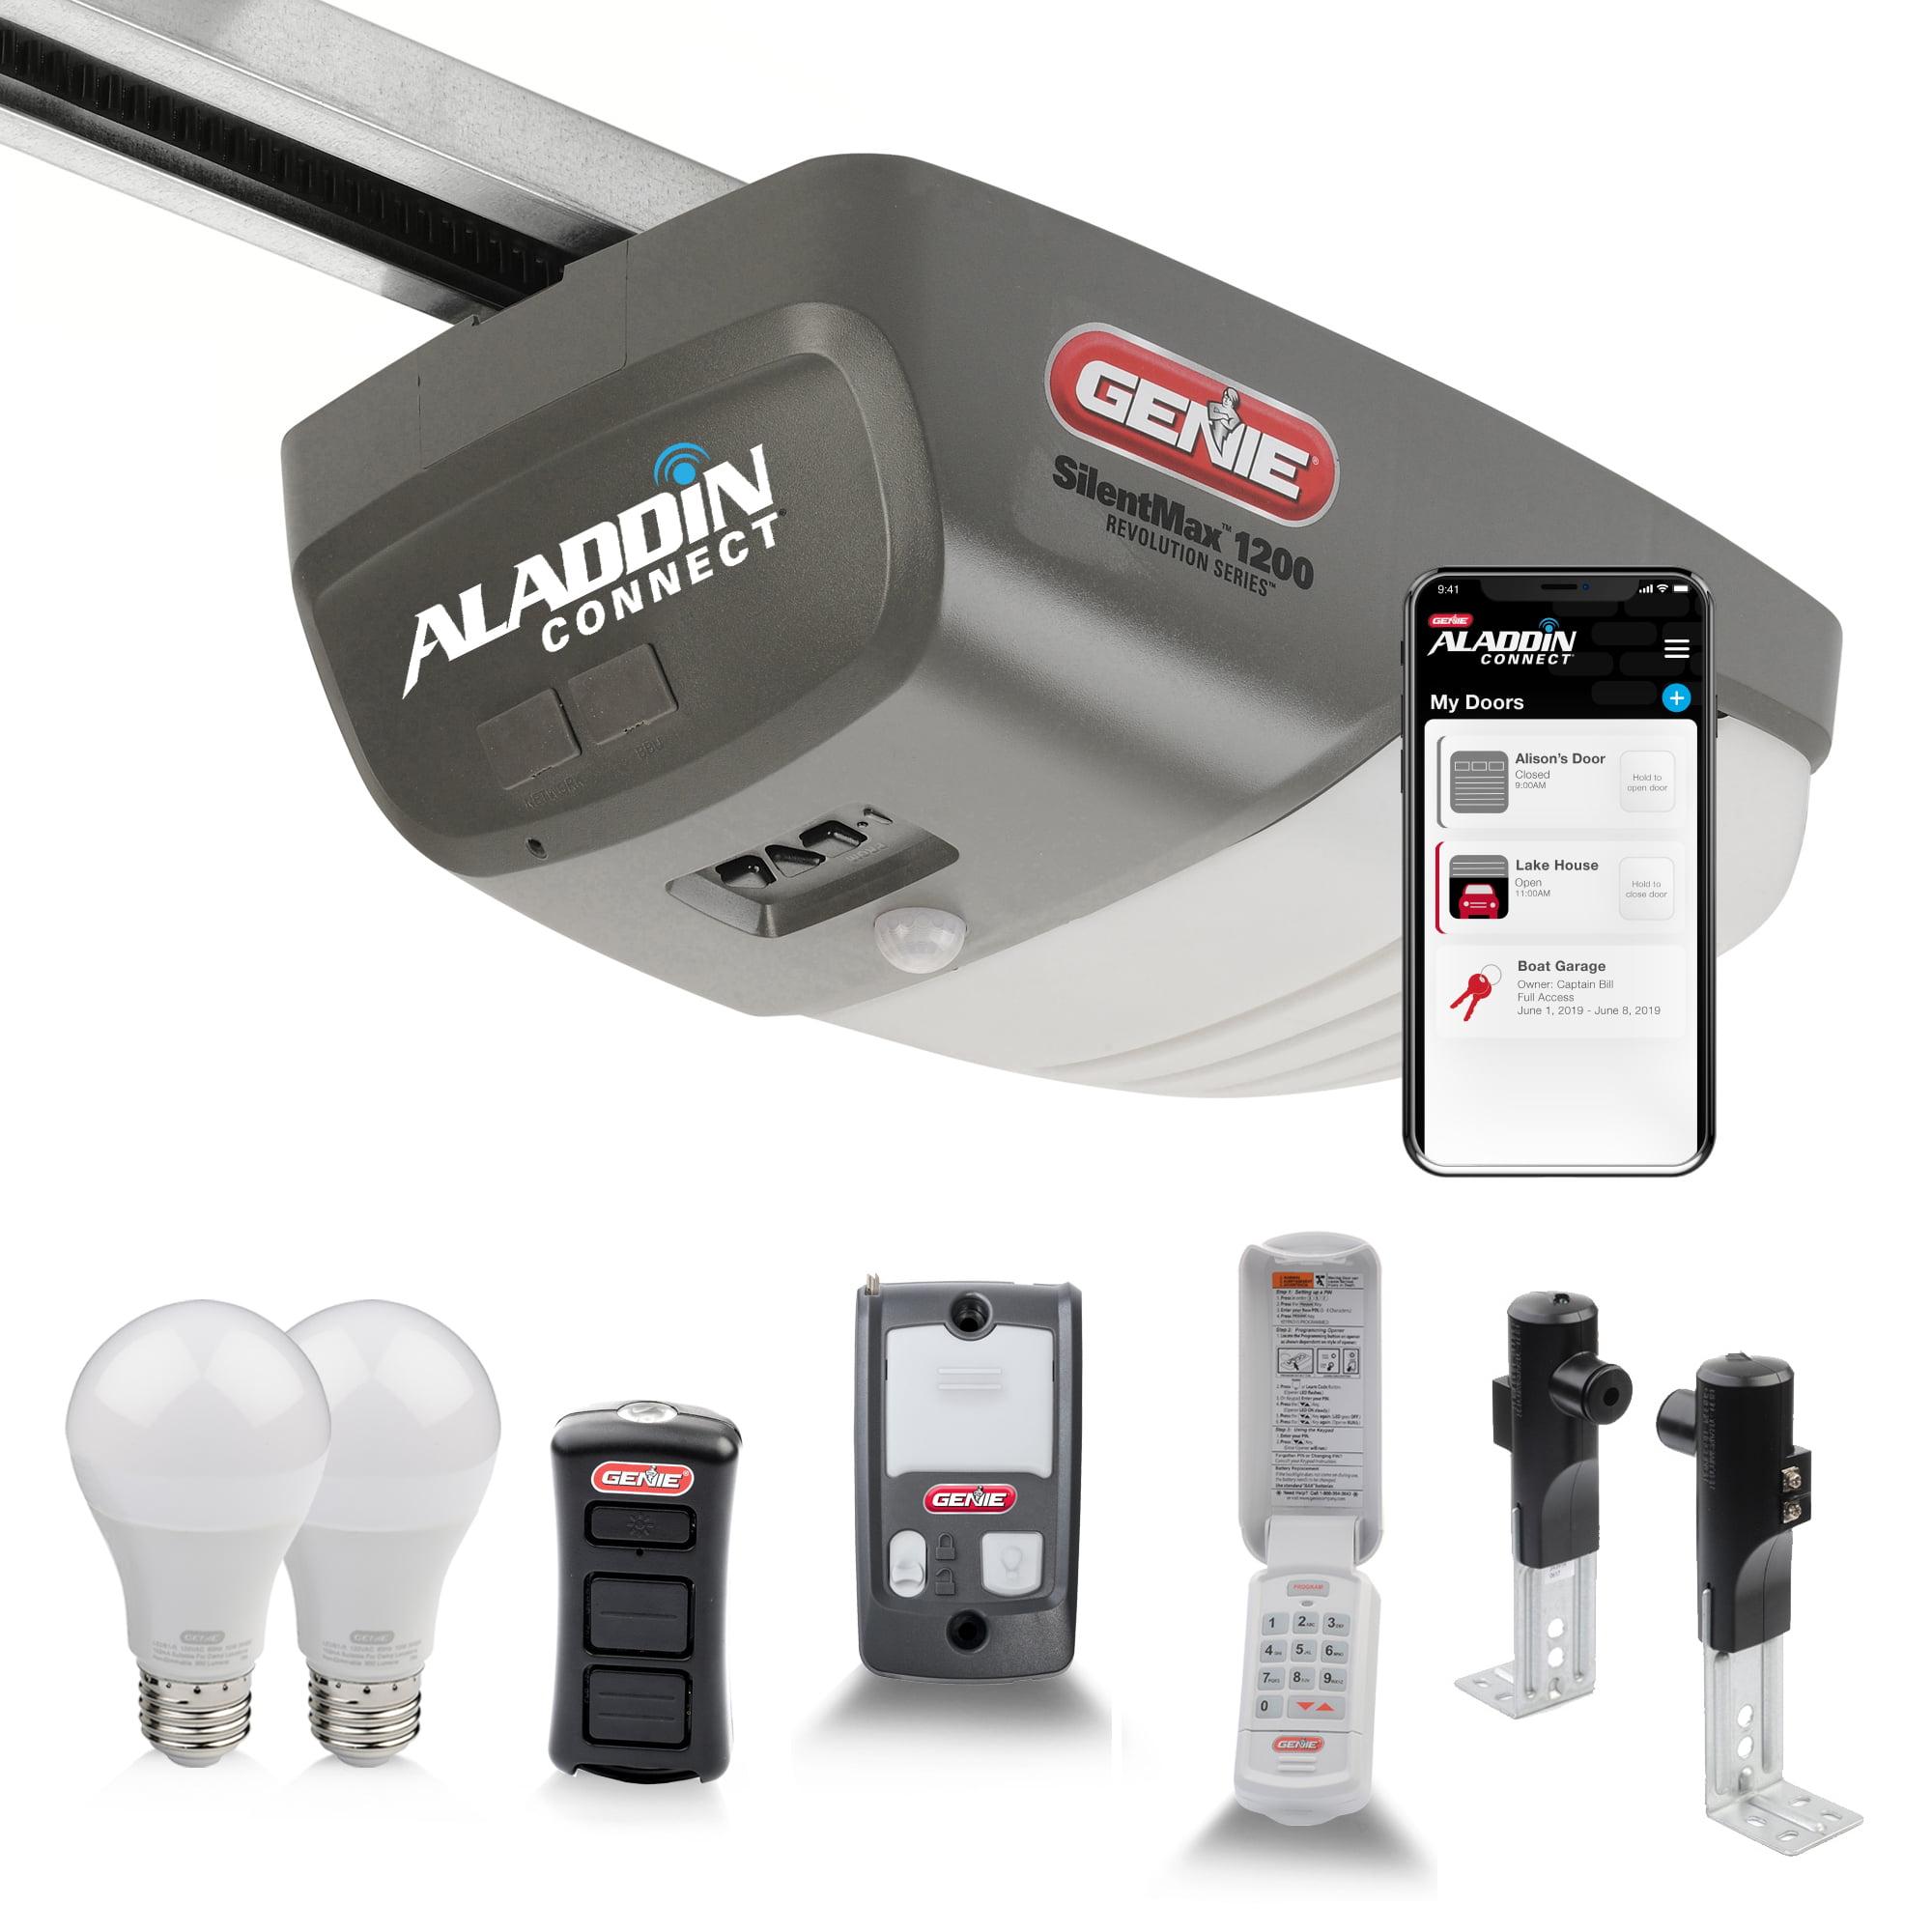 Genie Silentmax 1200 Essentials 3 4 Hpc Belt Drive Garage Door Opener Plus Aladdin Connect Smart Upgrade And Led Bulbs Walmart Com Walmart Com